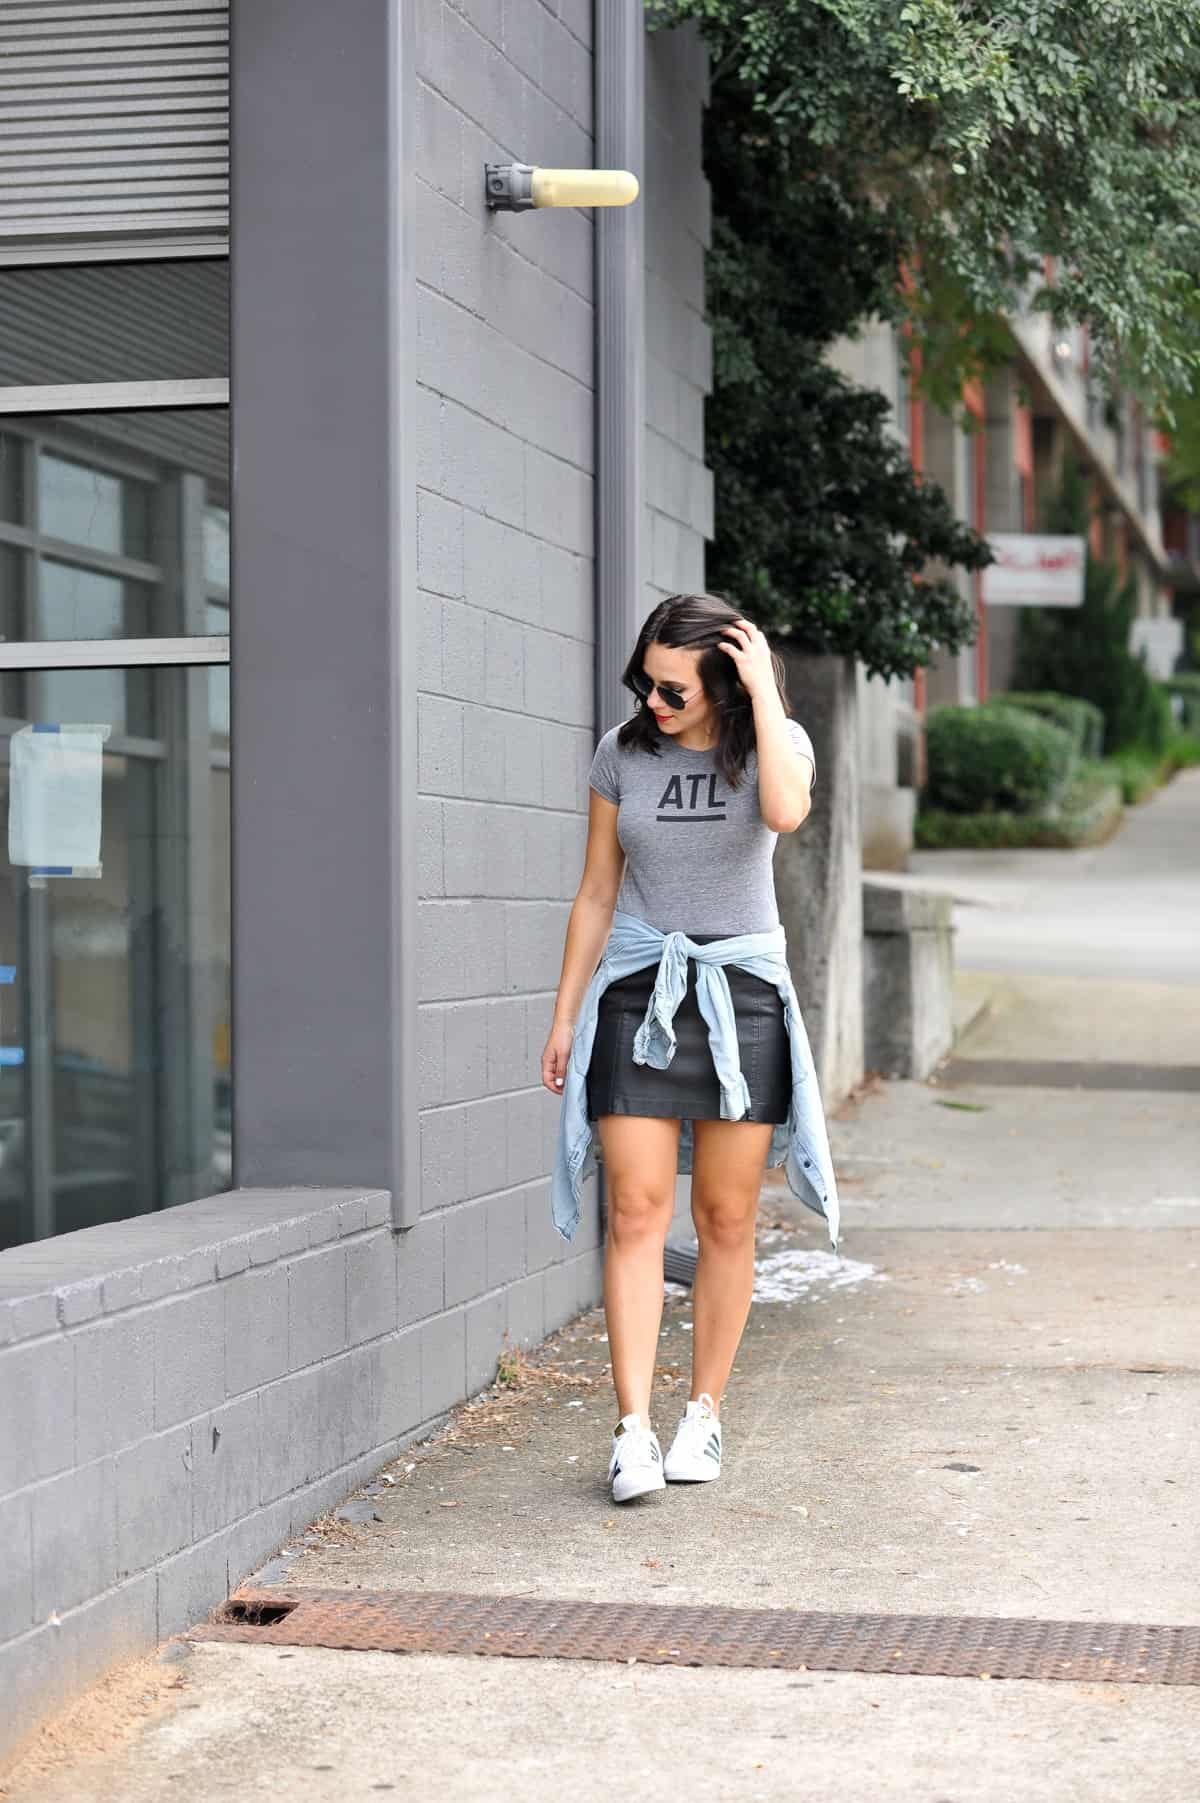 best atlanta based clothing brands, affordable outfit ideas, Adidas Superstars - My Style Vita - @mystylevita - 4